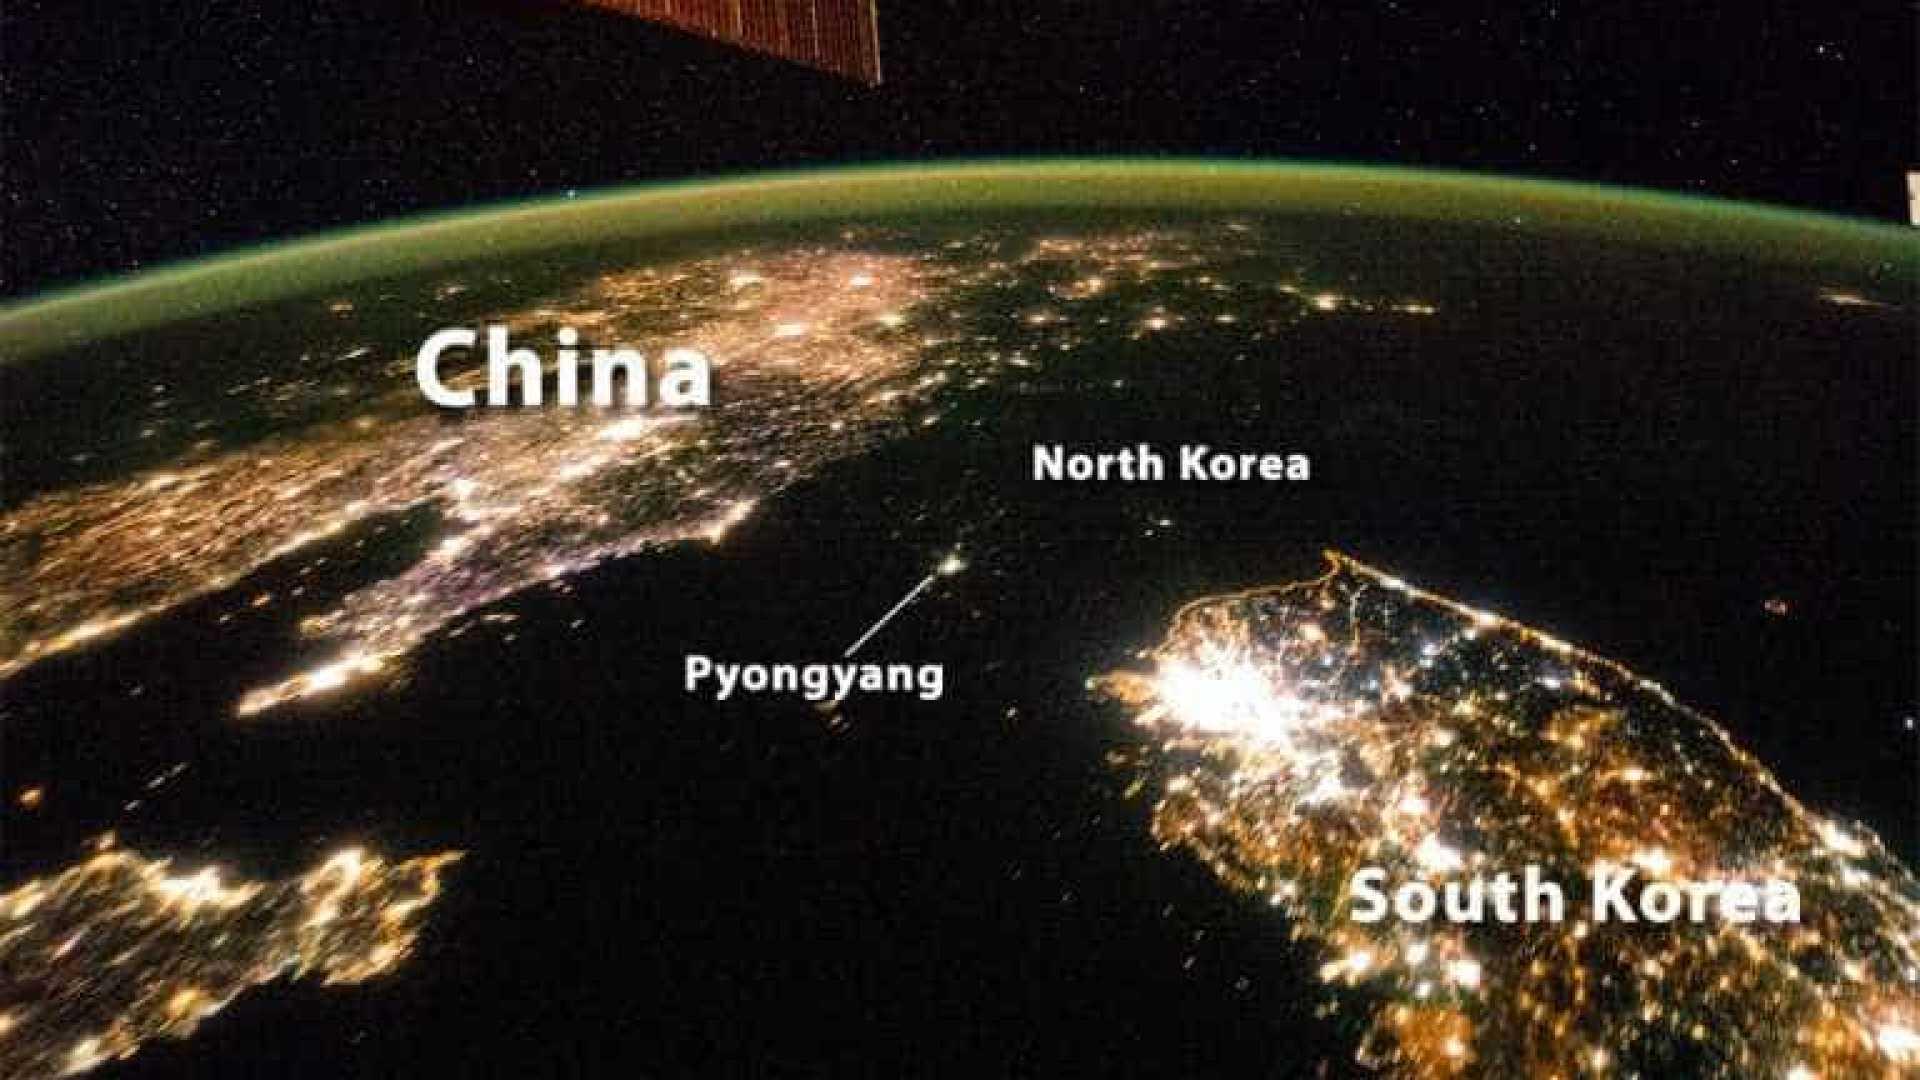 Macintosh HD:Users:brittanyloeffler:Downloads:Upwork:North Korea:11-1-1.jpg